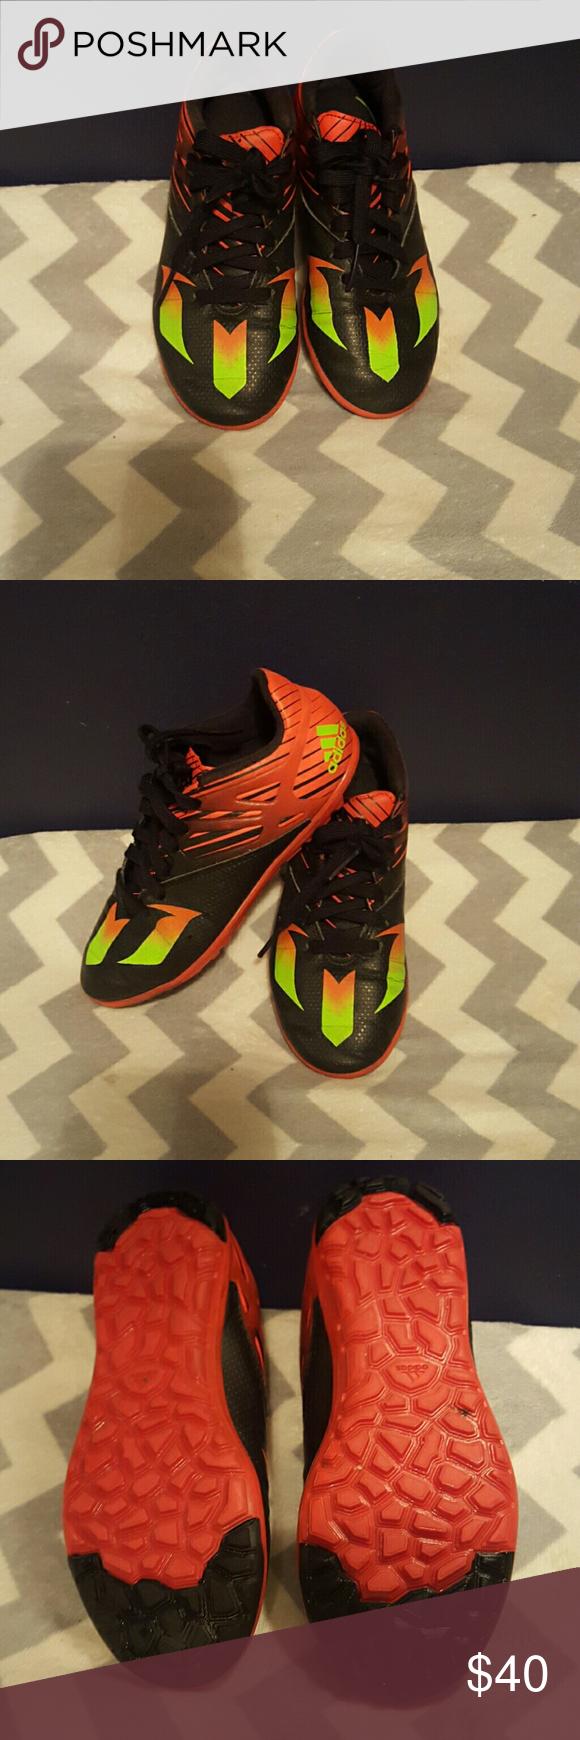 Adidas Youth Messi indoor soccer zapatos Youth tamaño Indoor Soccer